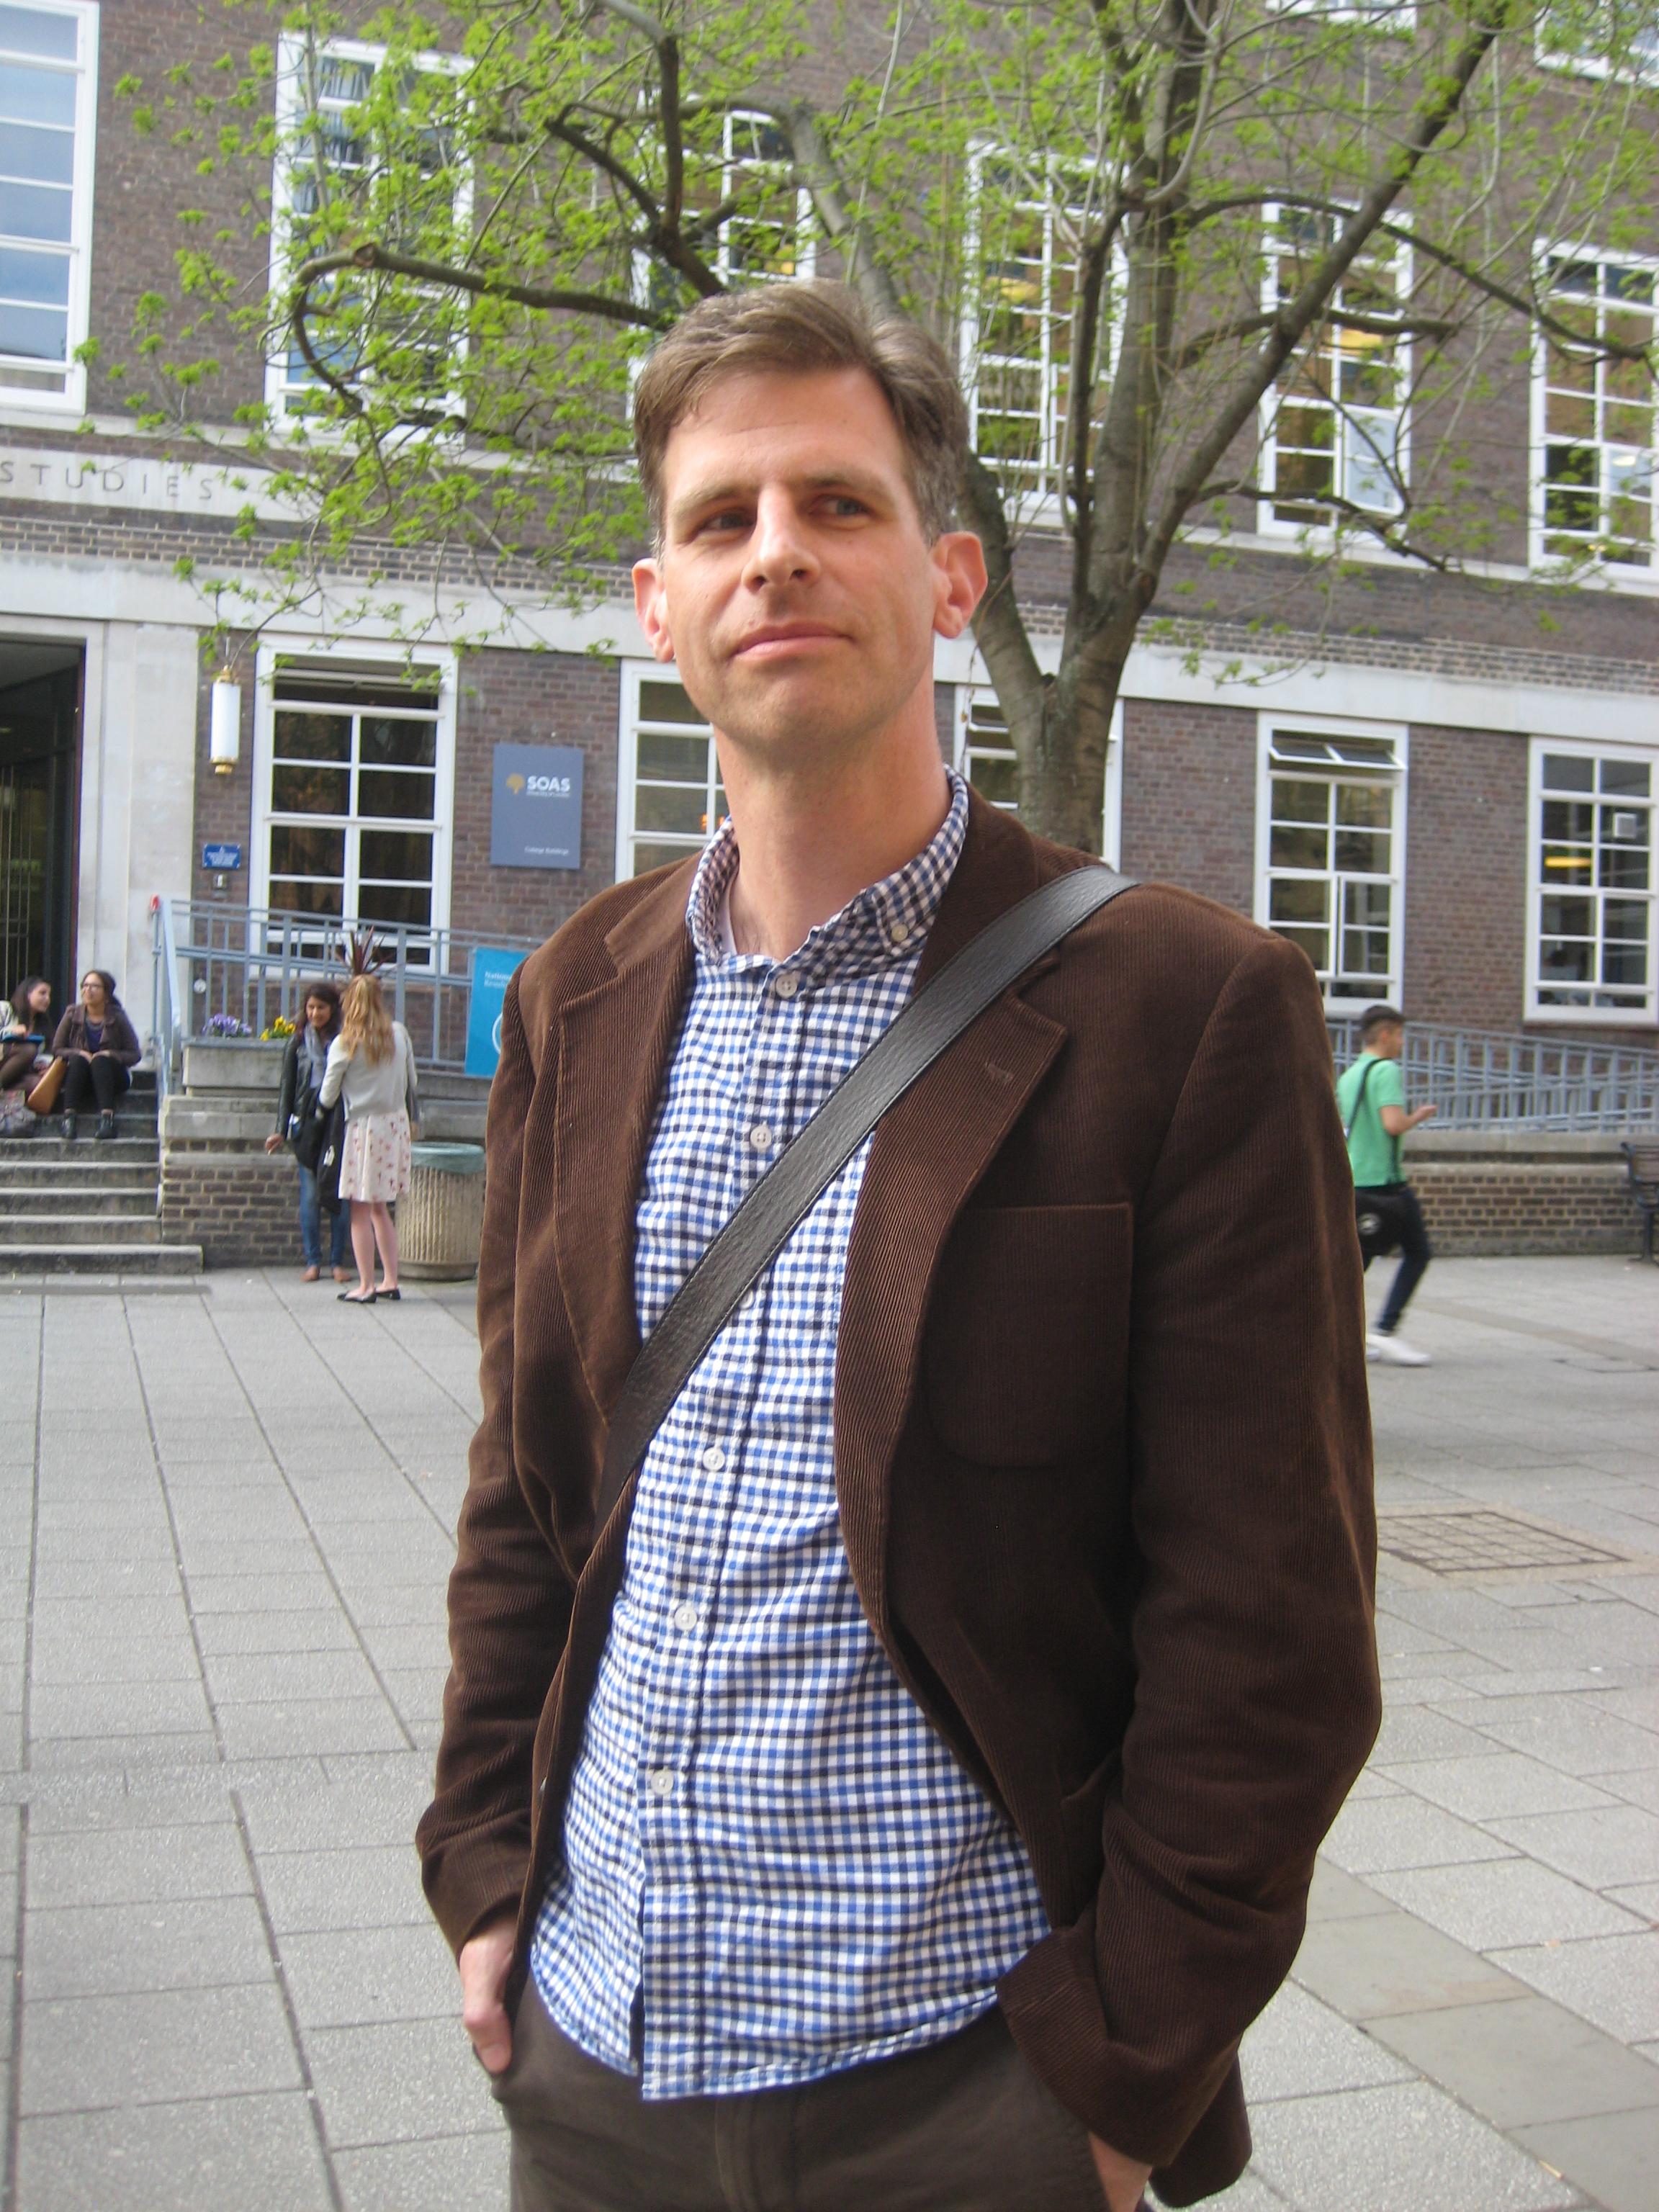 Sam van Schaik at [[SOAS University of London]] in 2013